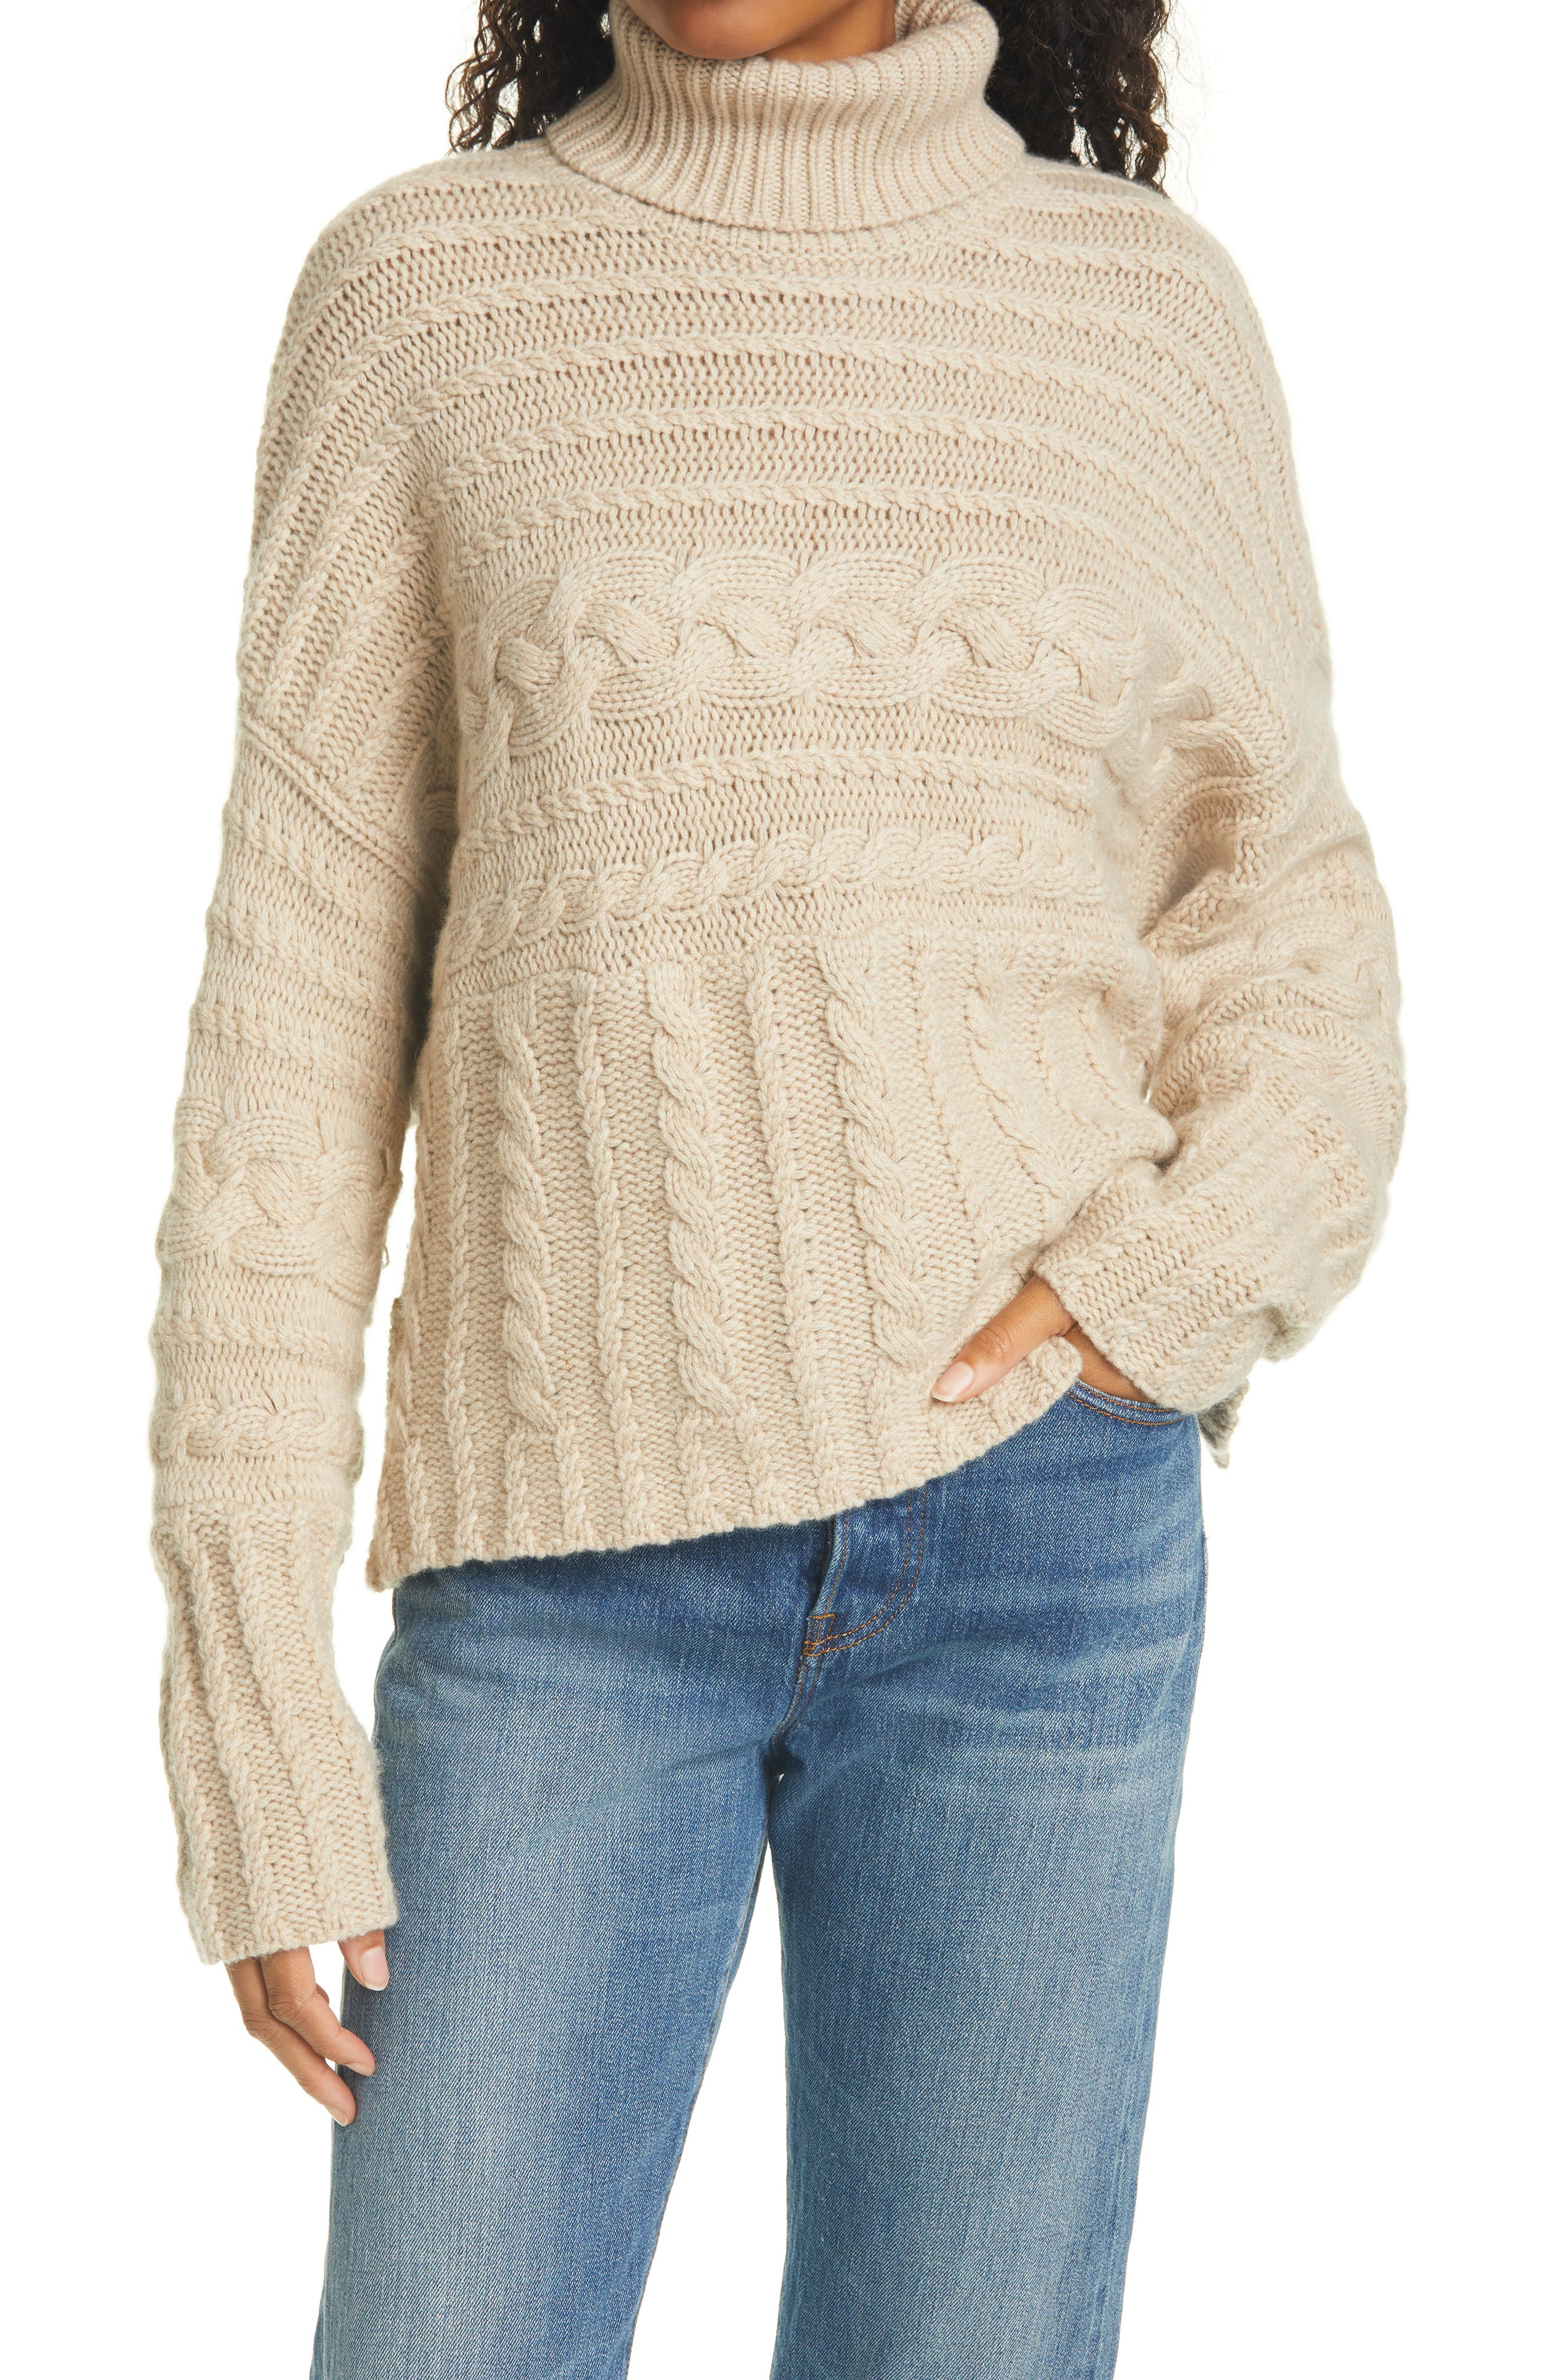 LAND/'S END CANVAS Women/'s Turtleneck Sweater Chunky Knit Black XXS 00 0 NEW